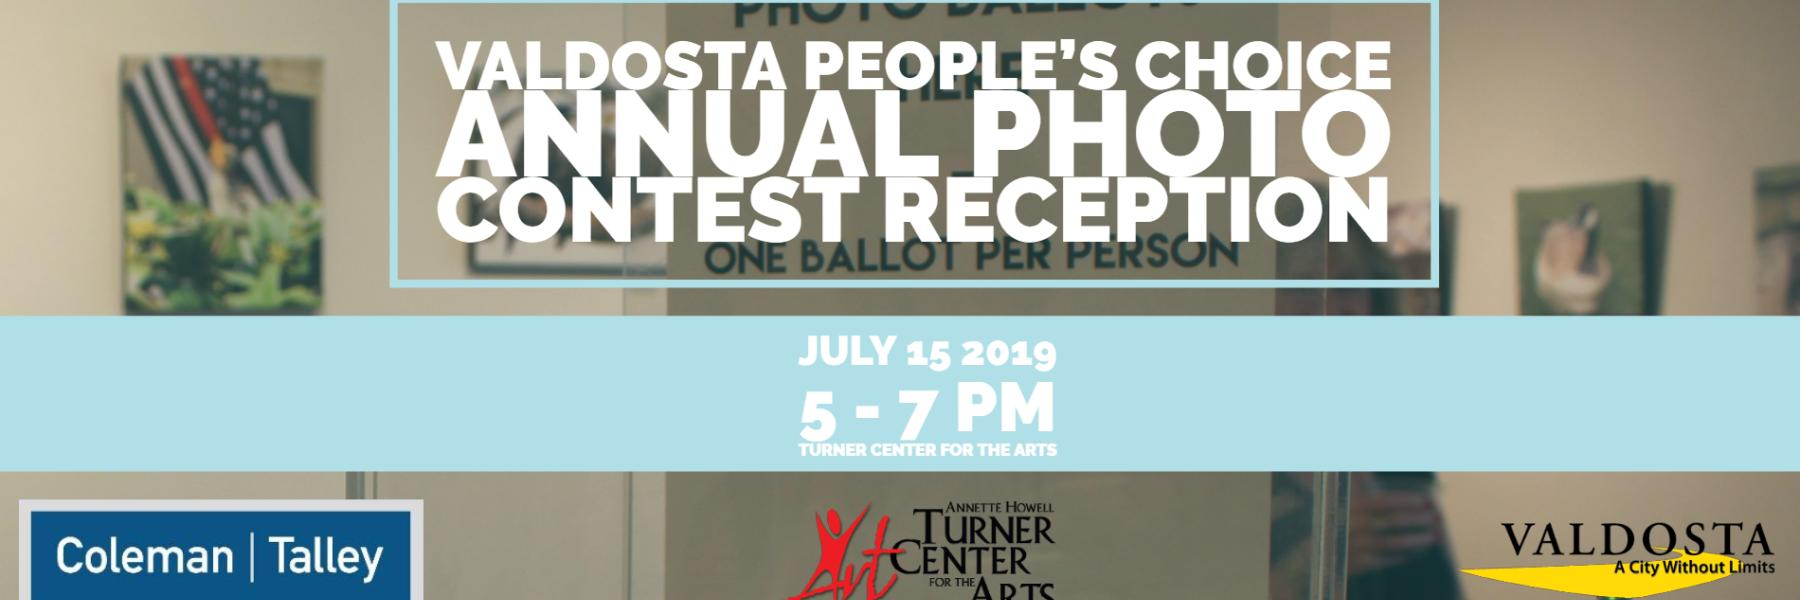 Photo Contest Reception